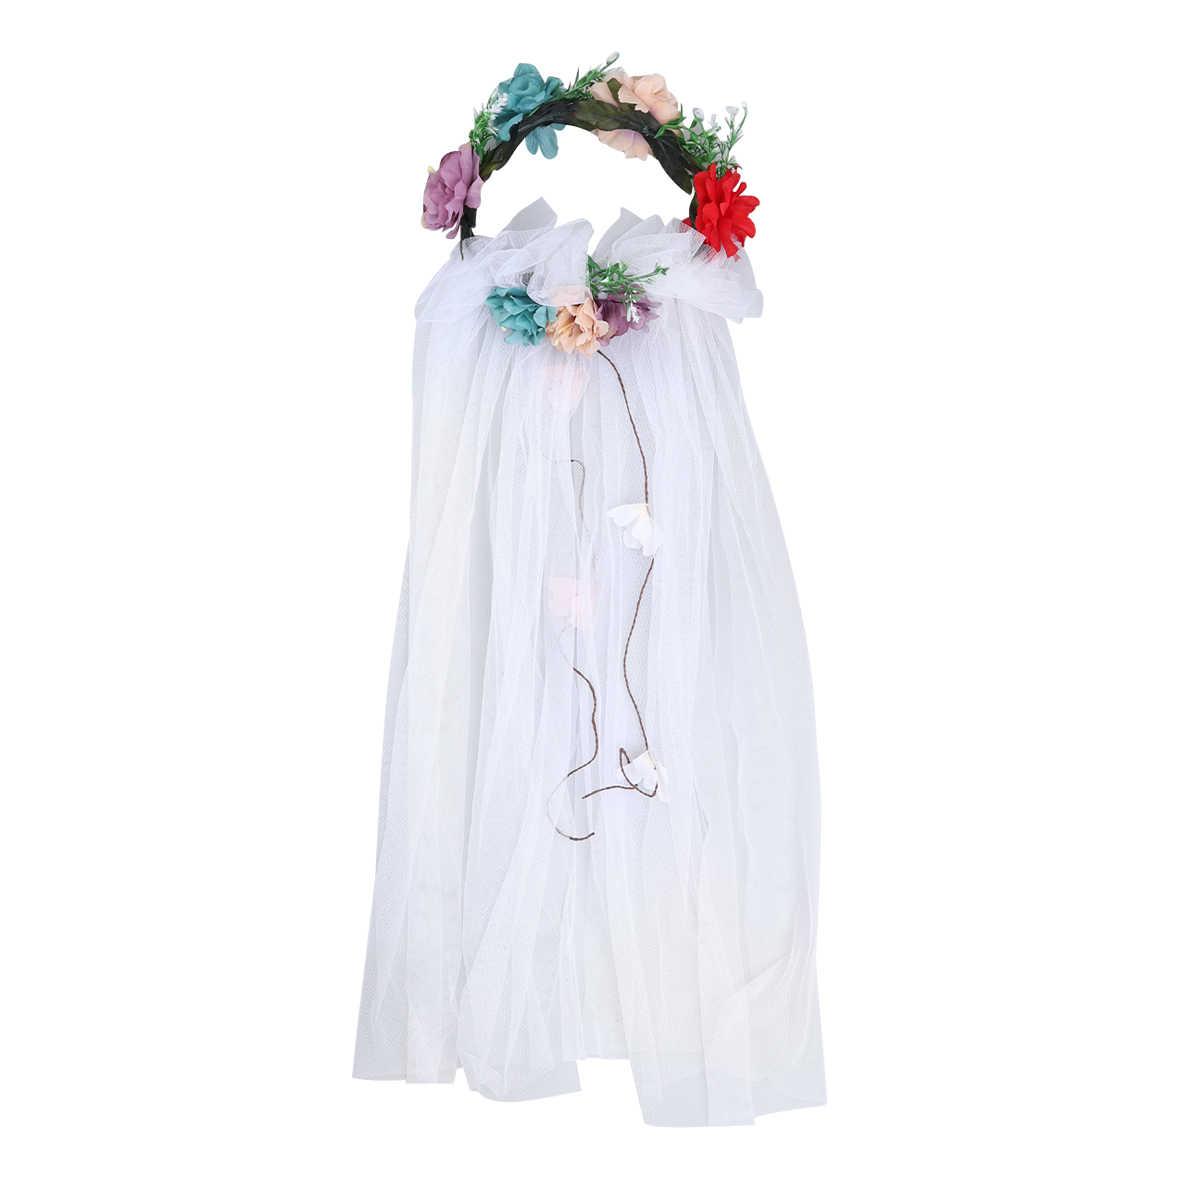 1 pc ウェディングベールと花輪ハロウィンブライダルヘッドドレスウェディングドレスベール人工ローズベールヘアバンド女性のための